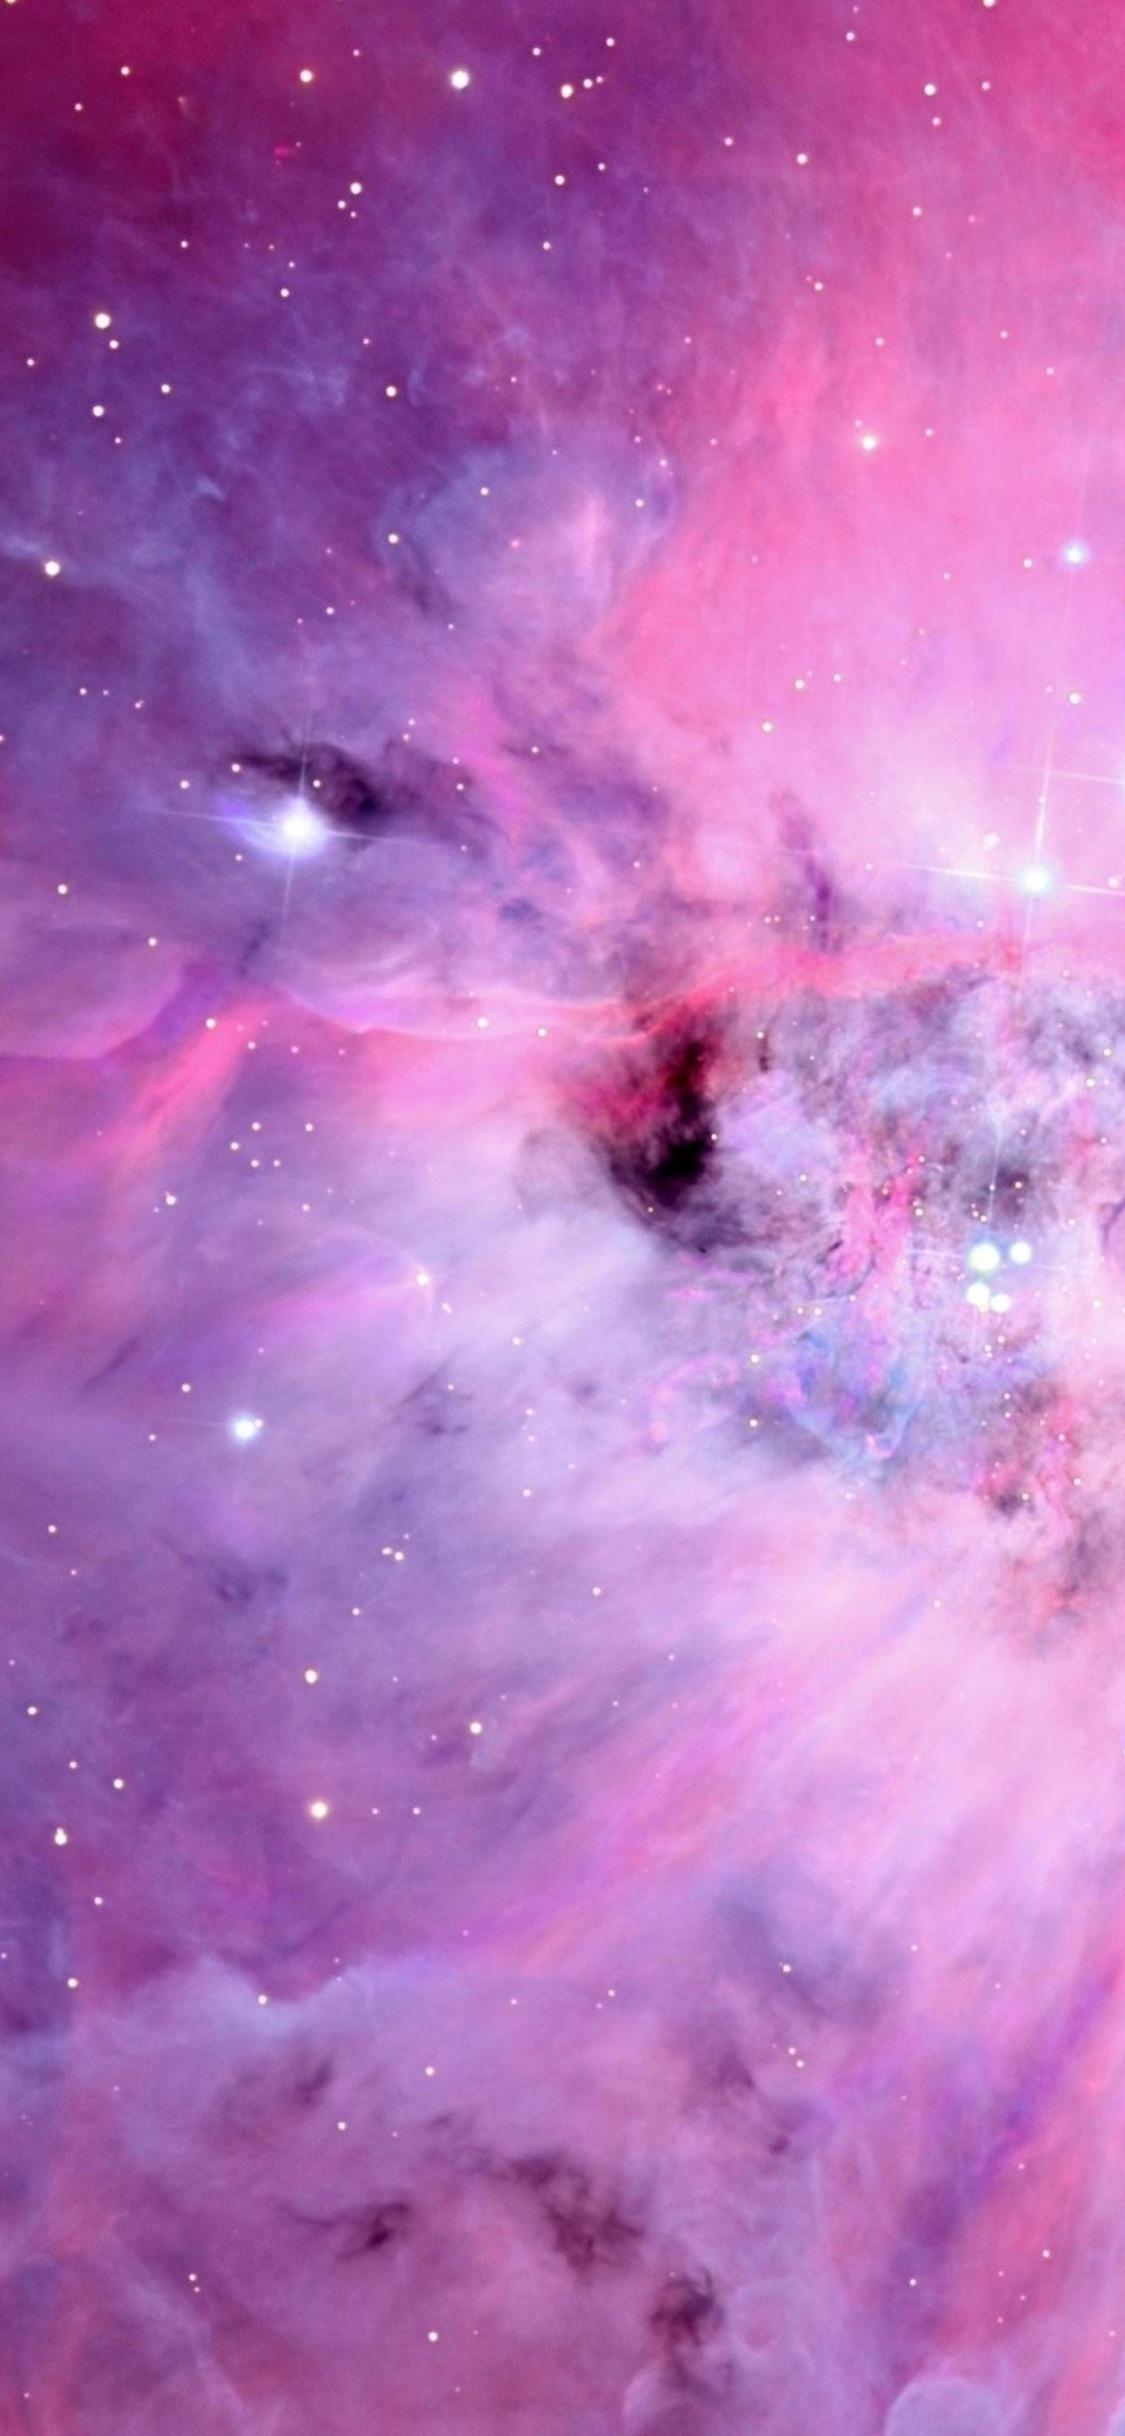 space-stars-nebula-galaxy-clouds-bw.jpg